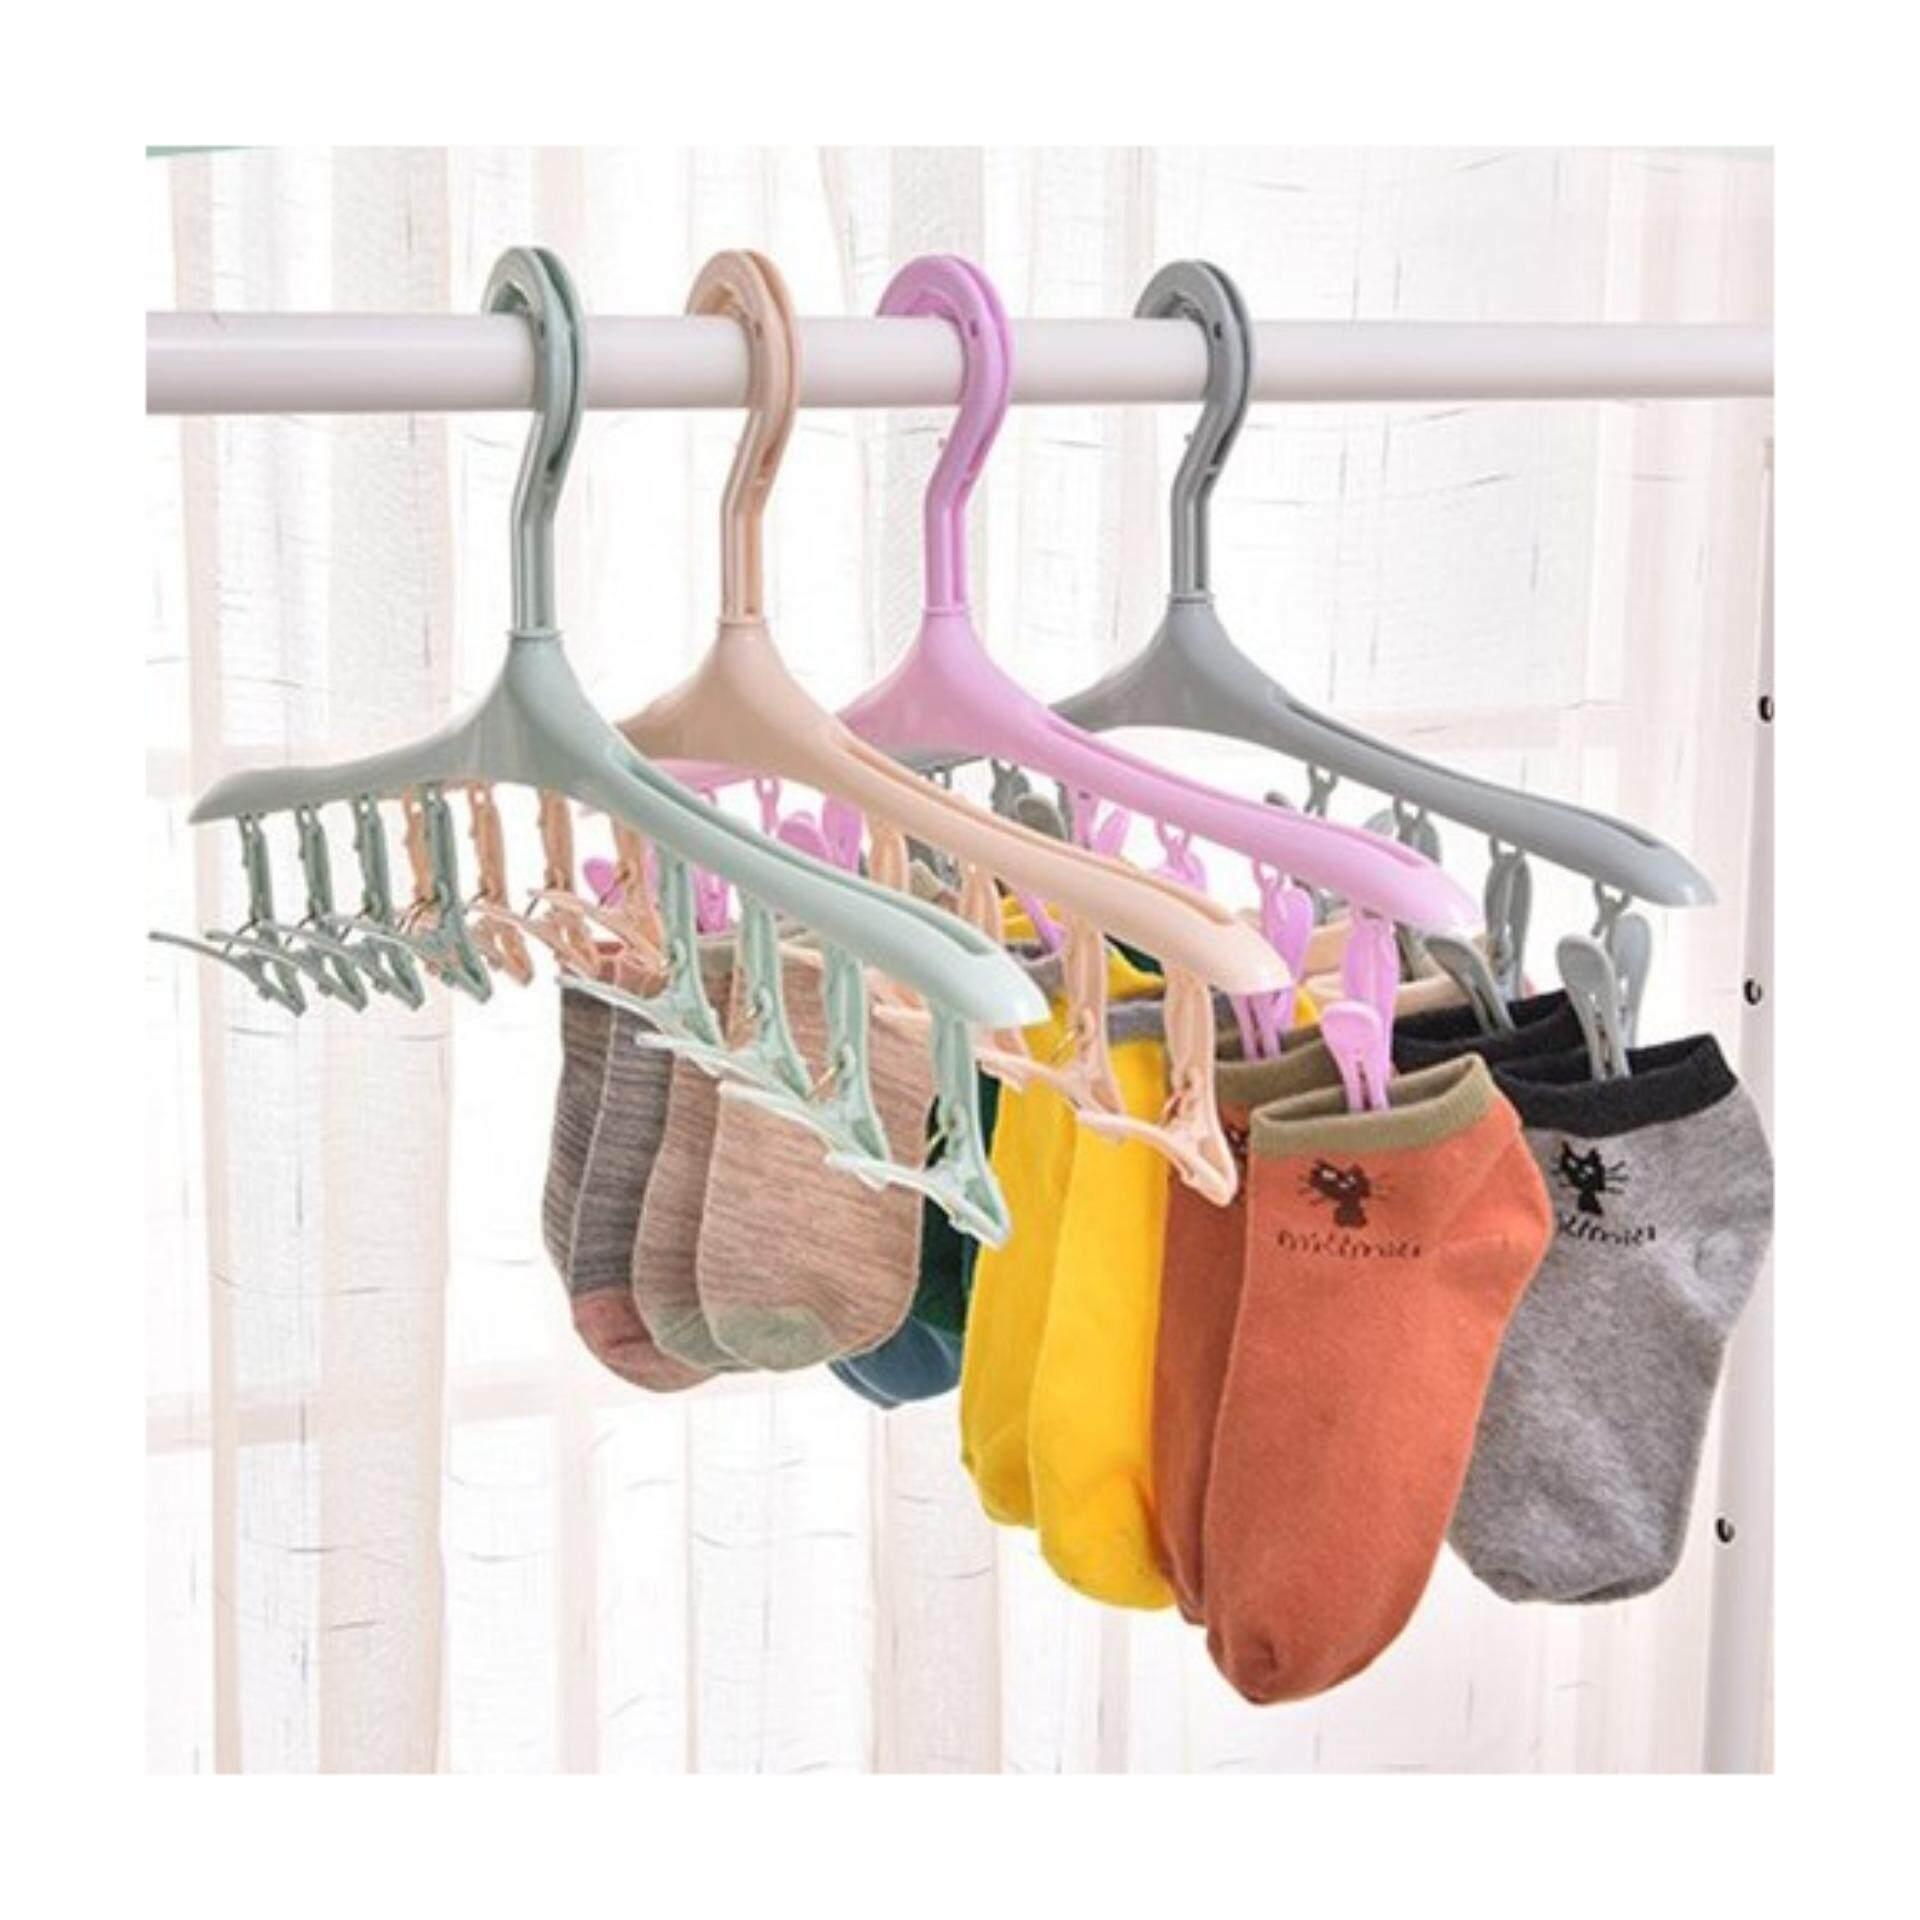 Function Plastic Windproof Clothes Hanger Socks Rack Hanger, Underwear Drying Hanger Clothes Rack with 8 Clips